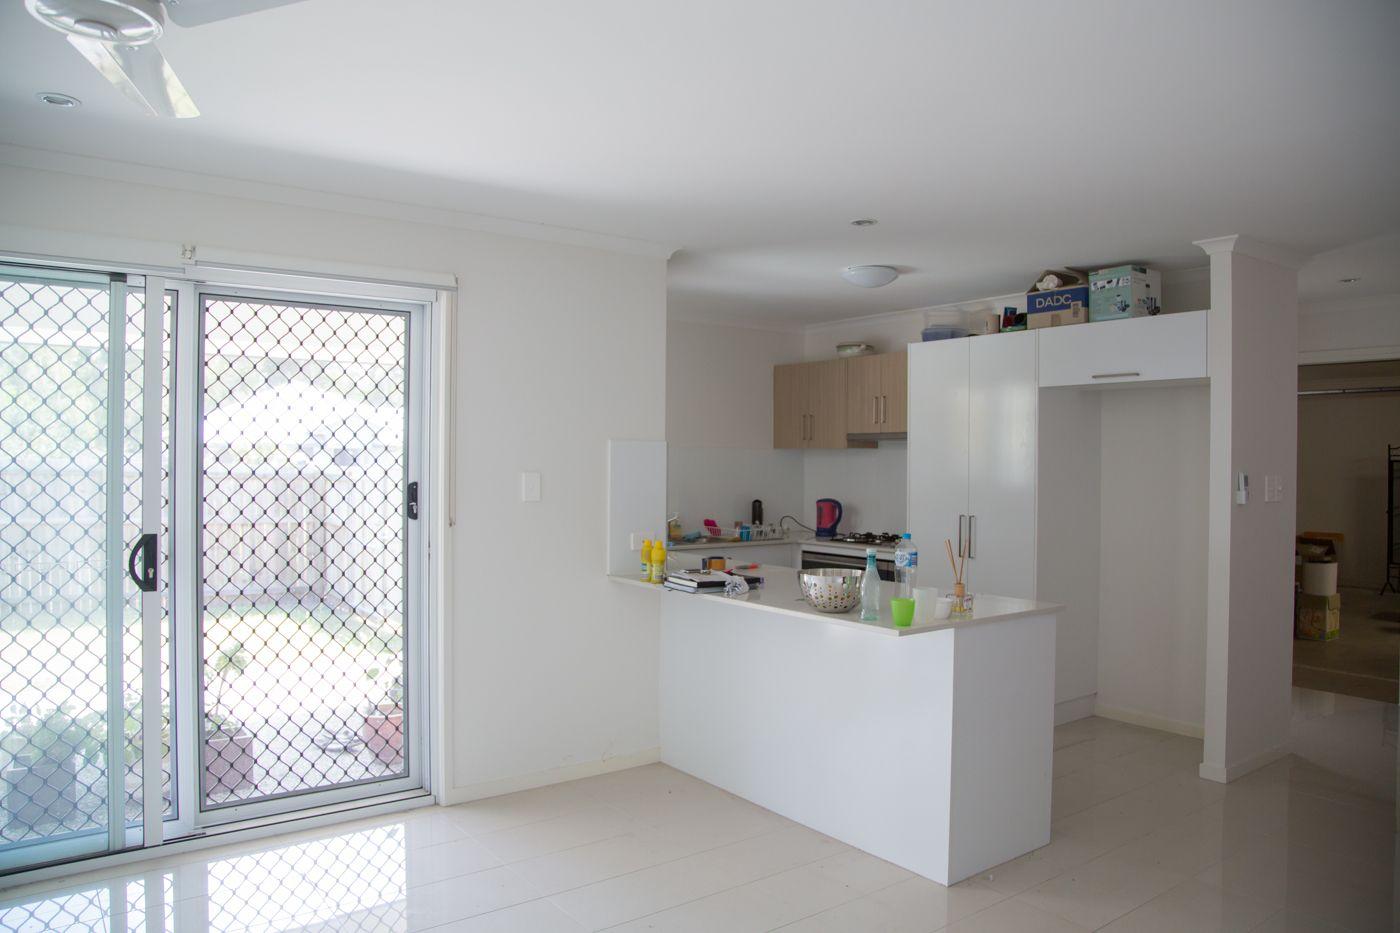 1/19 Honeysuckle Court, Buderim QLD 4556, Image 1